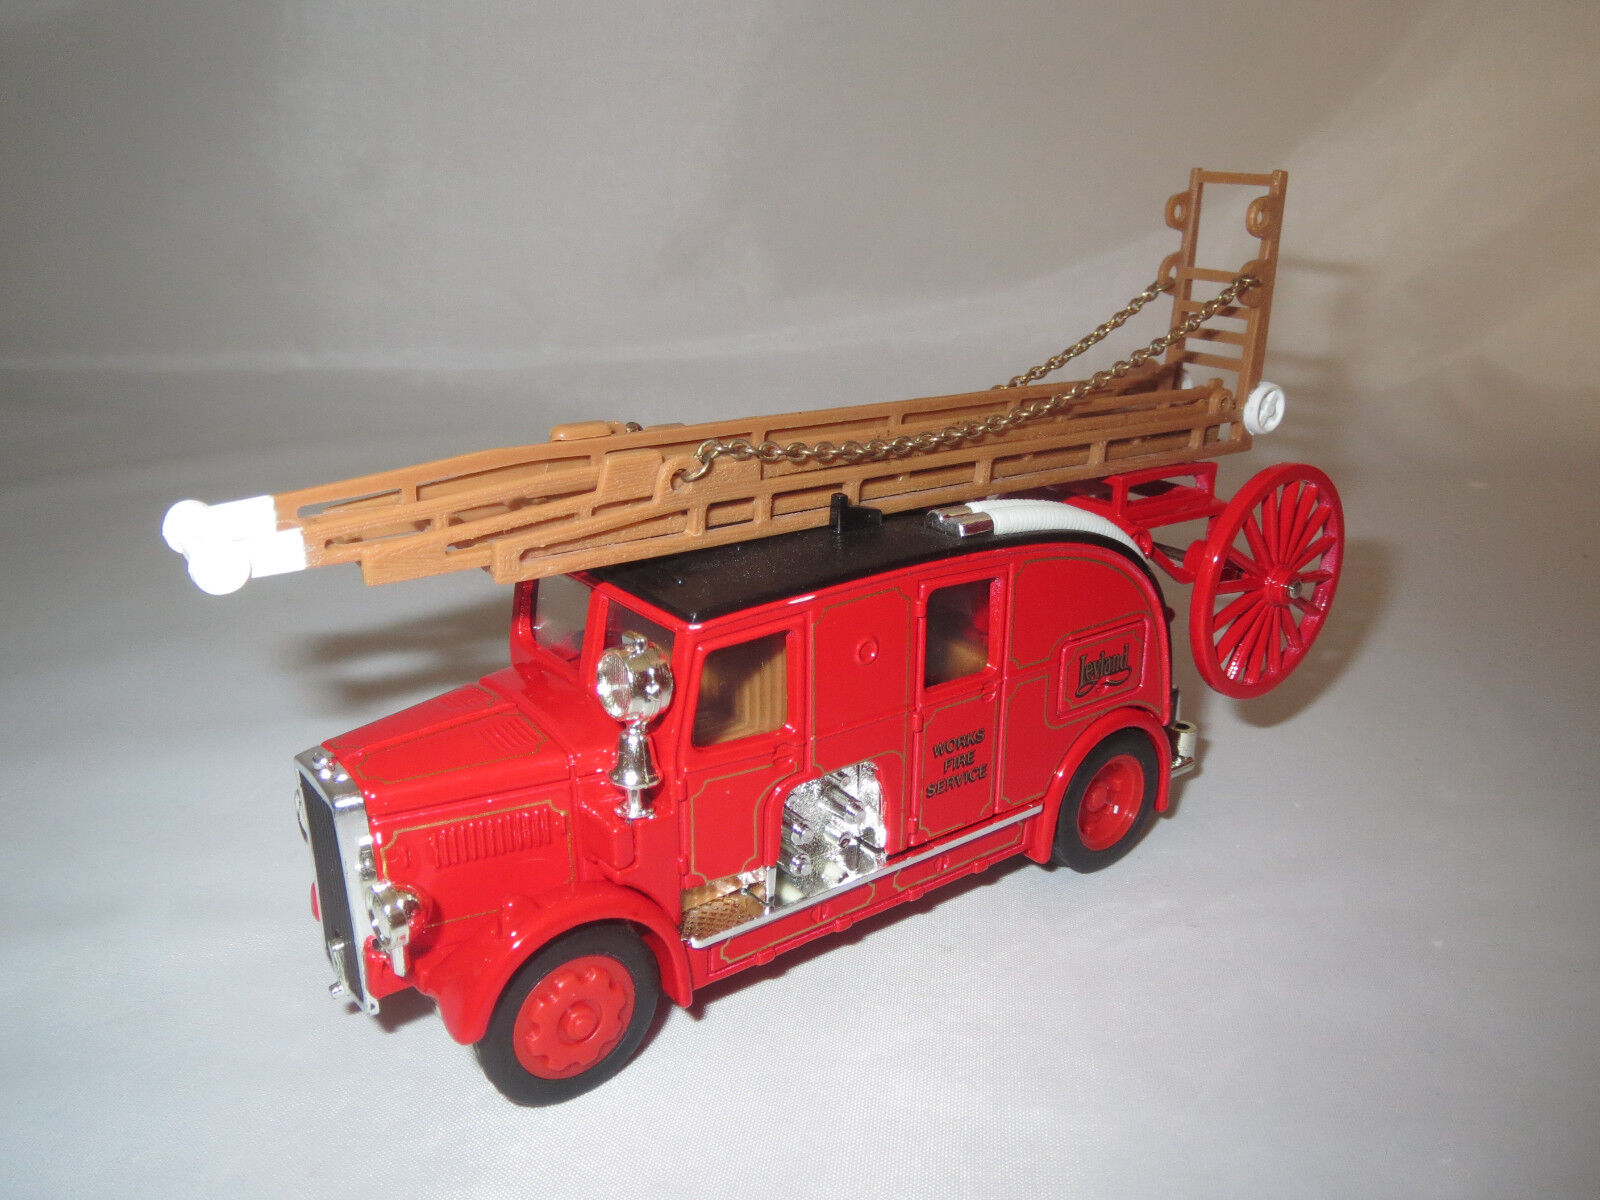 Matchbox Leyland Cub Fire Engine fk-7' 1936  1 49 OVP